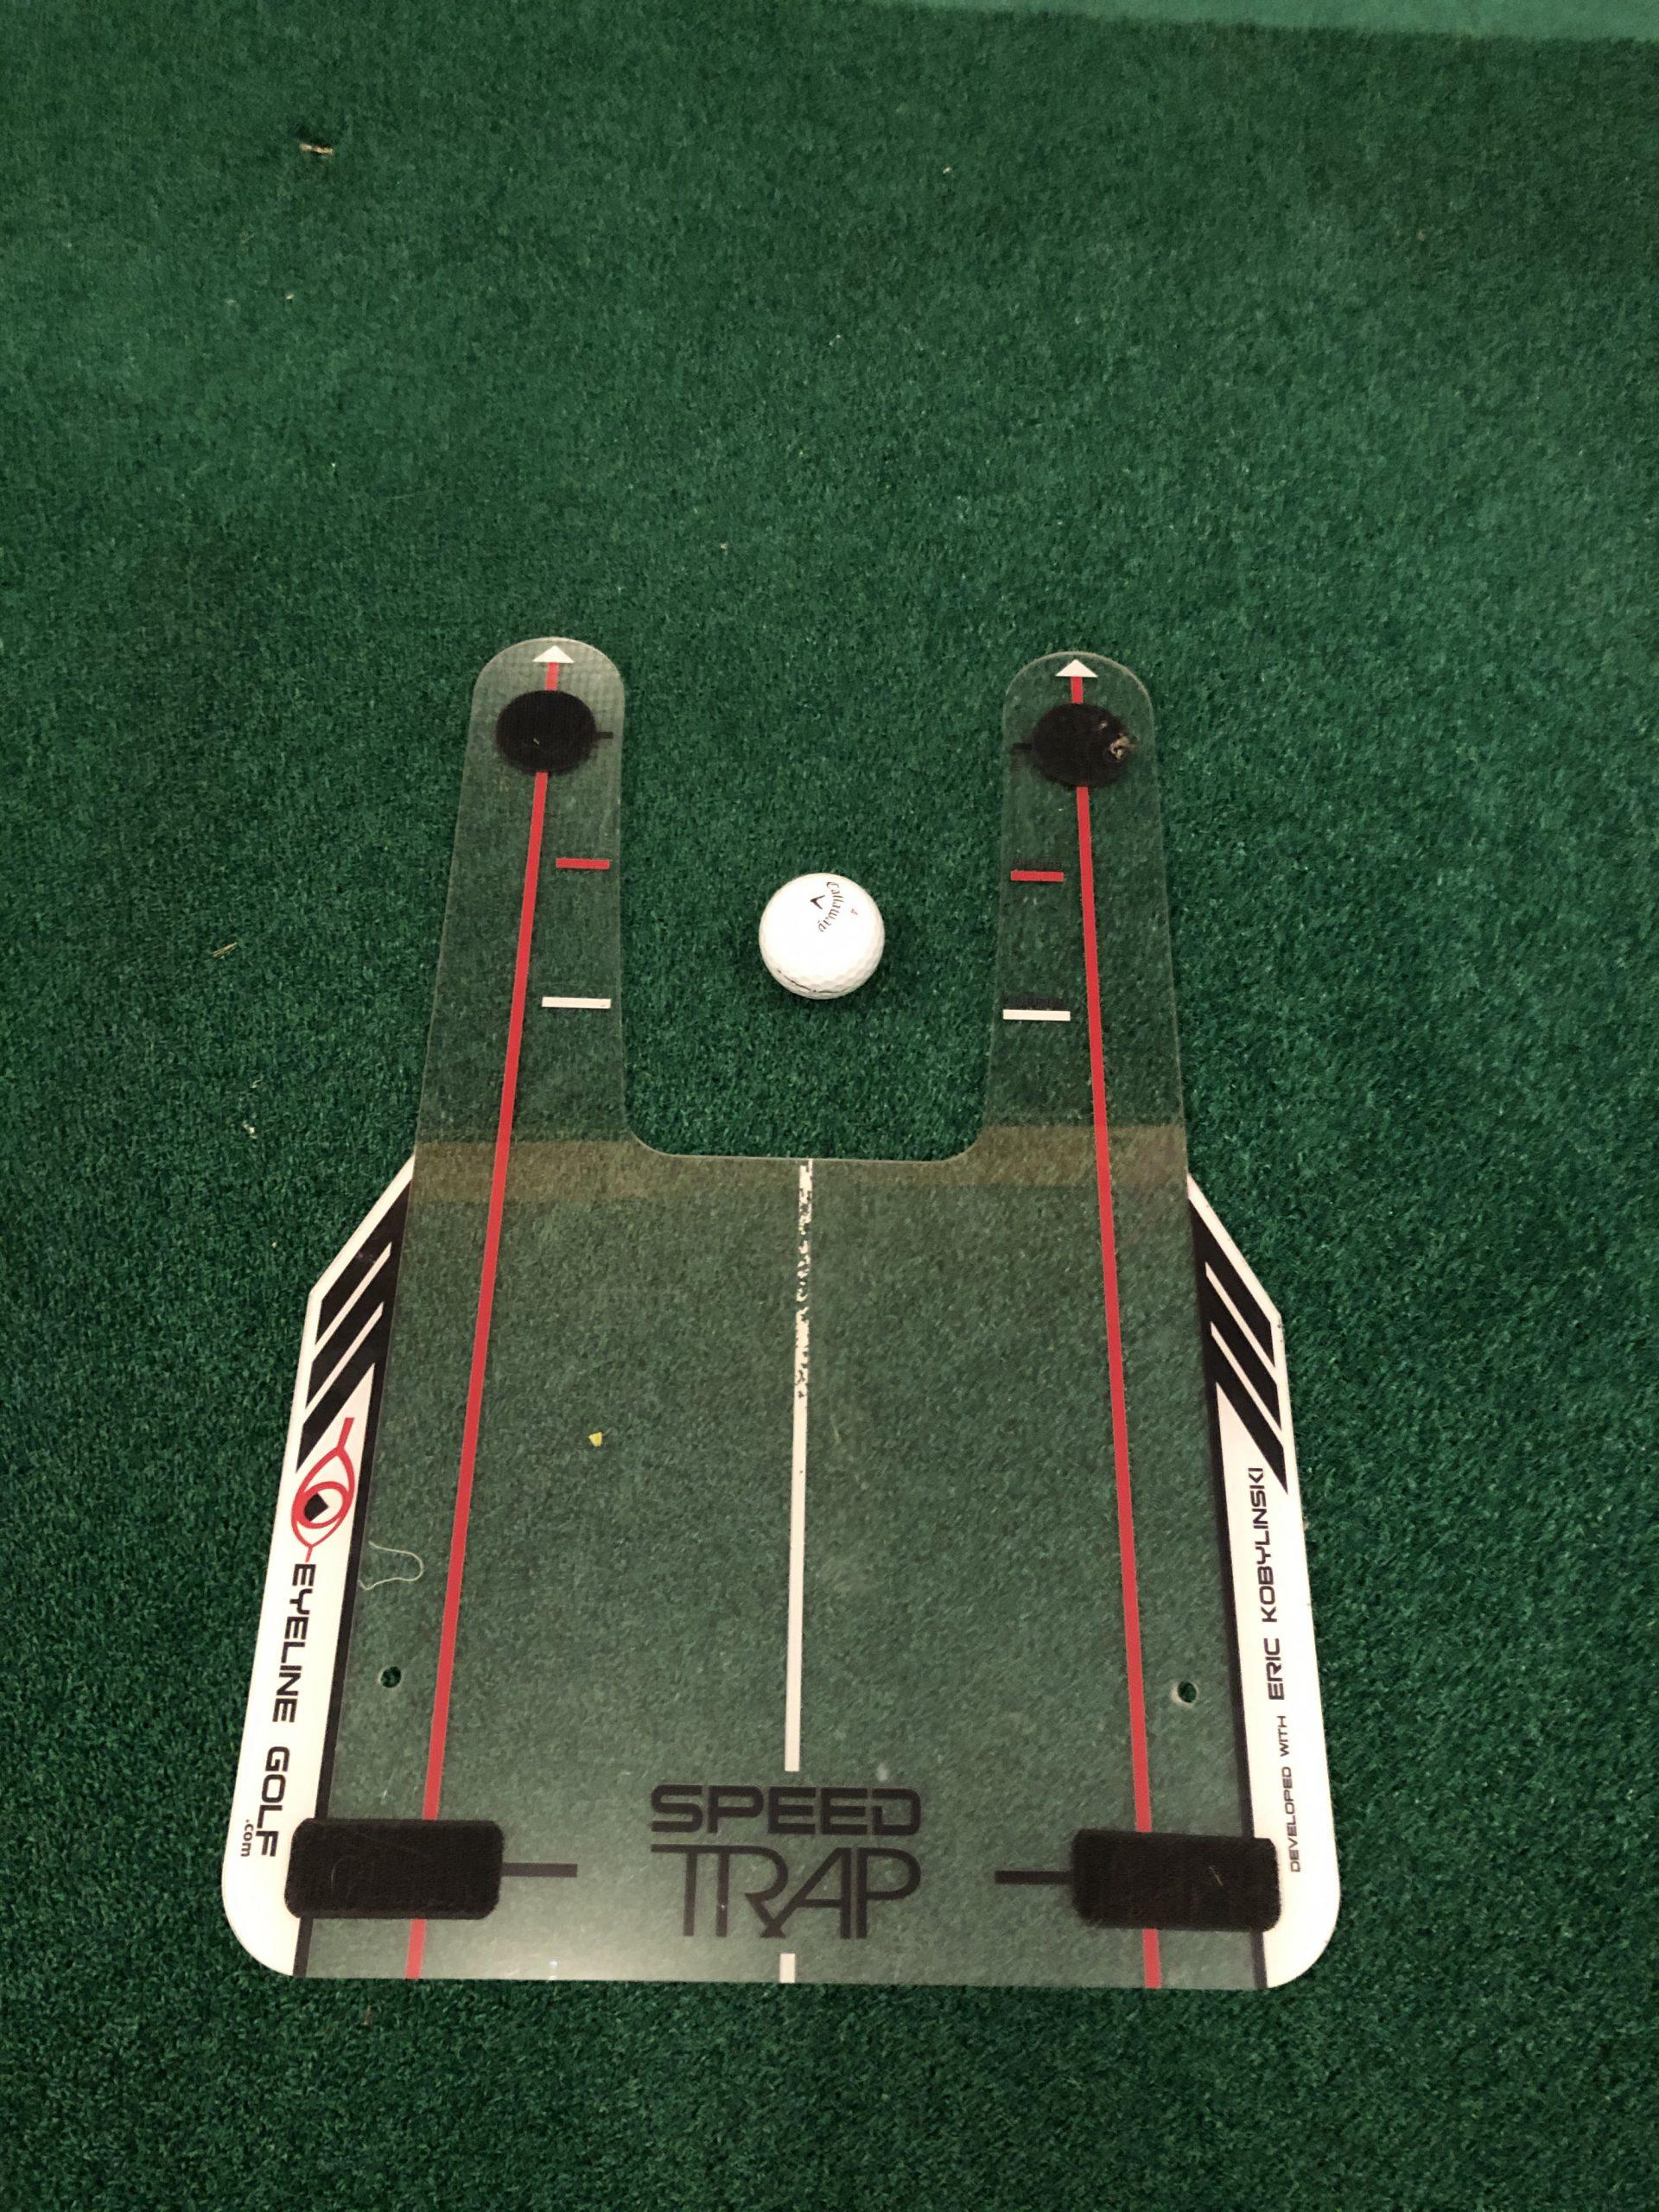 Alignment golf tool